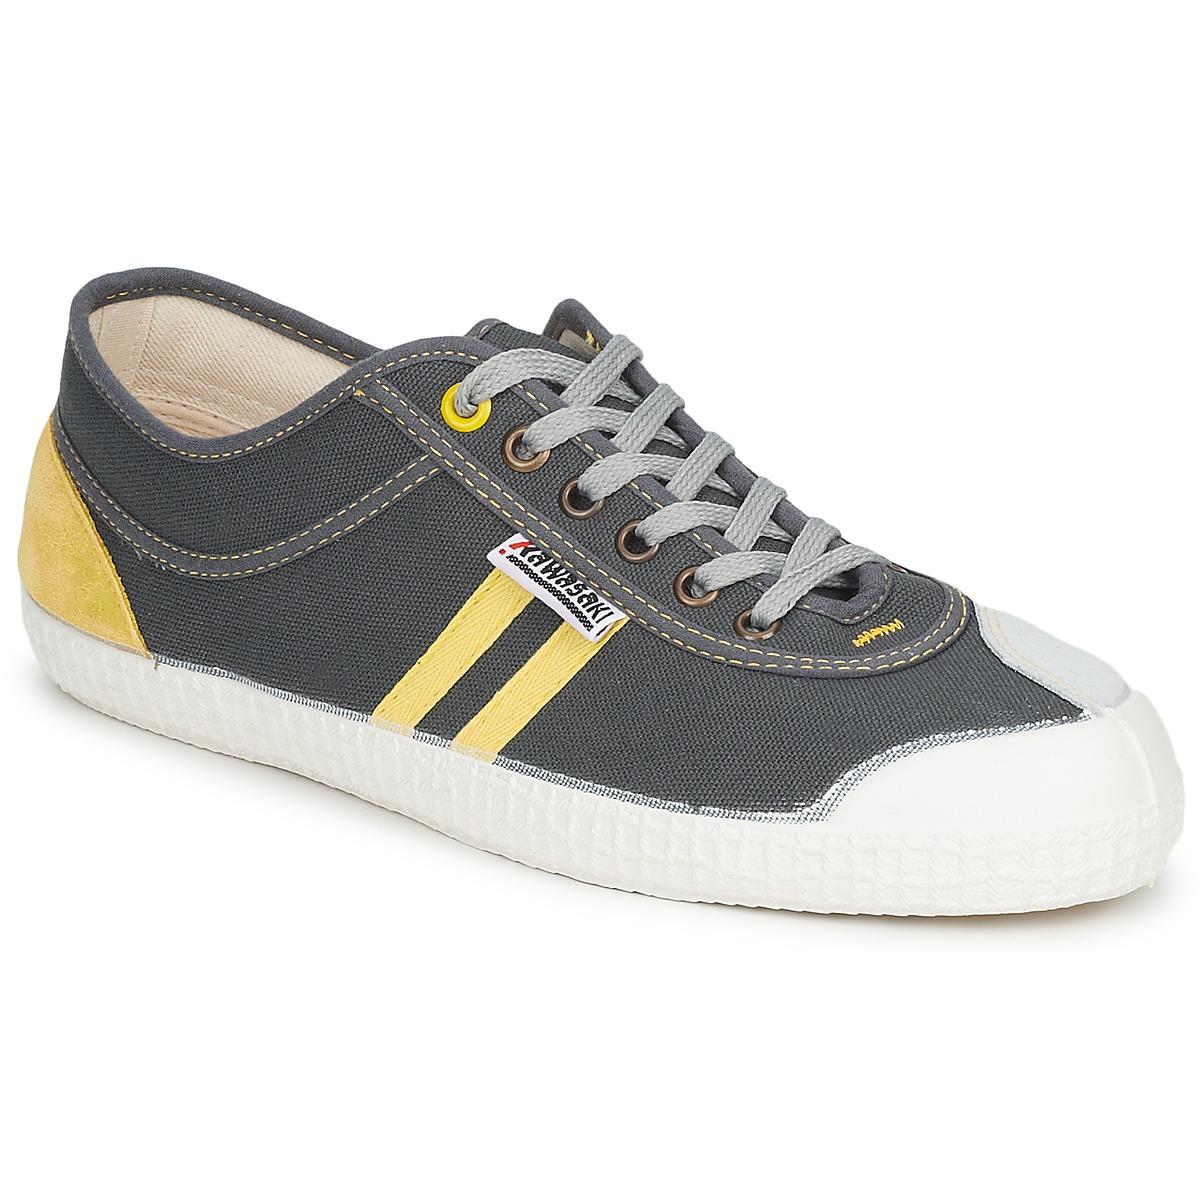 Kawasaki RETRO Grau / Gelb - Kostenloser Versand bei Spartoode ! - Schuhe Sneaker Low  32,50 €